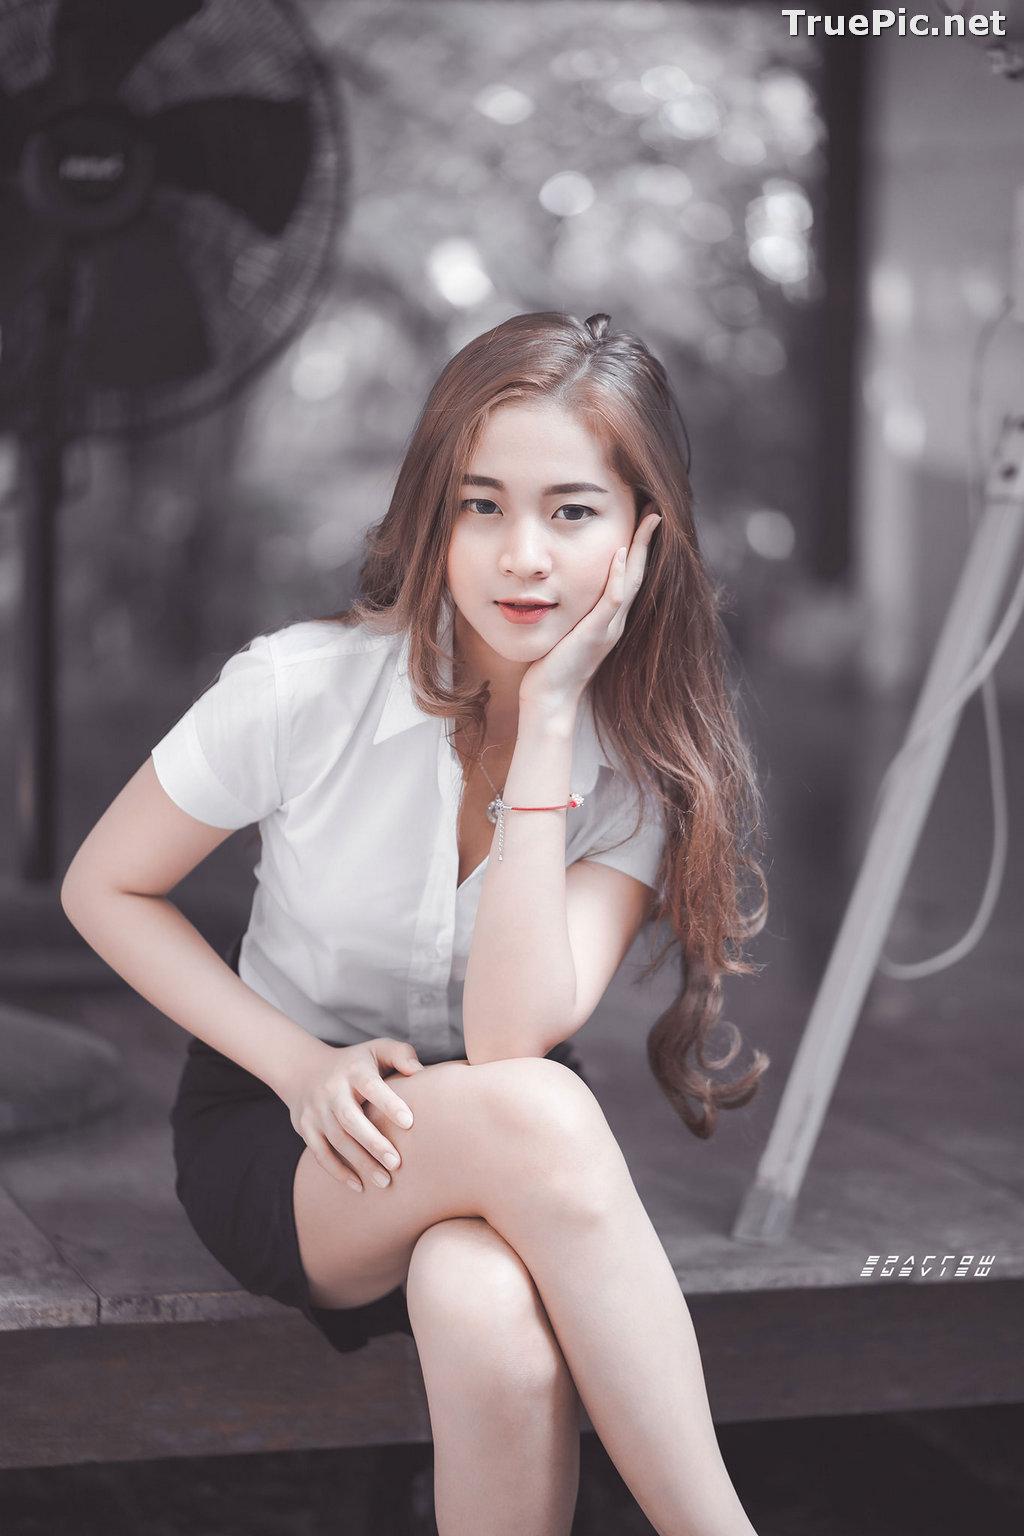 Image Thailand Model - นิภาภรณ์ เลิศนิติวัฒนา - Student Uniform - TruePic.net - Picture-7